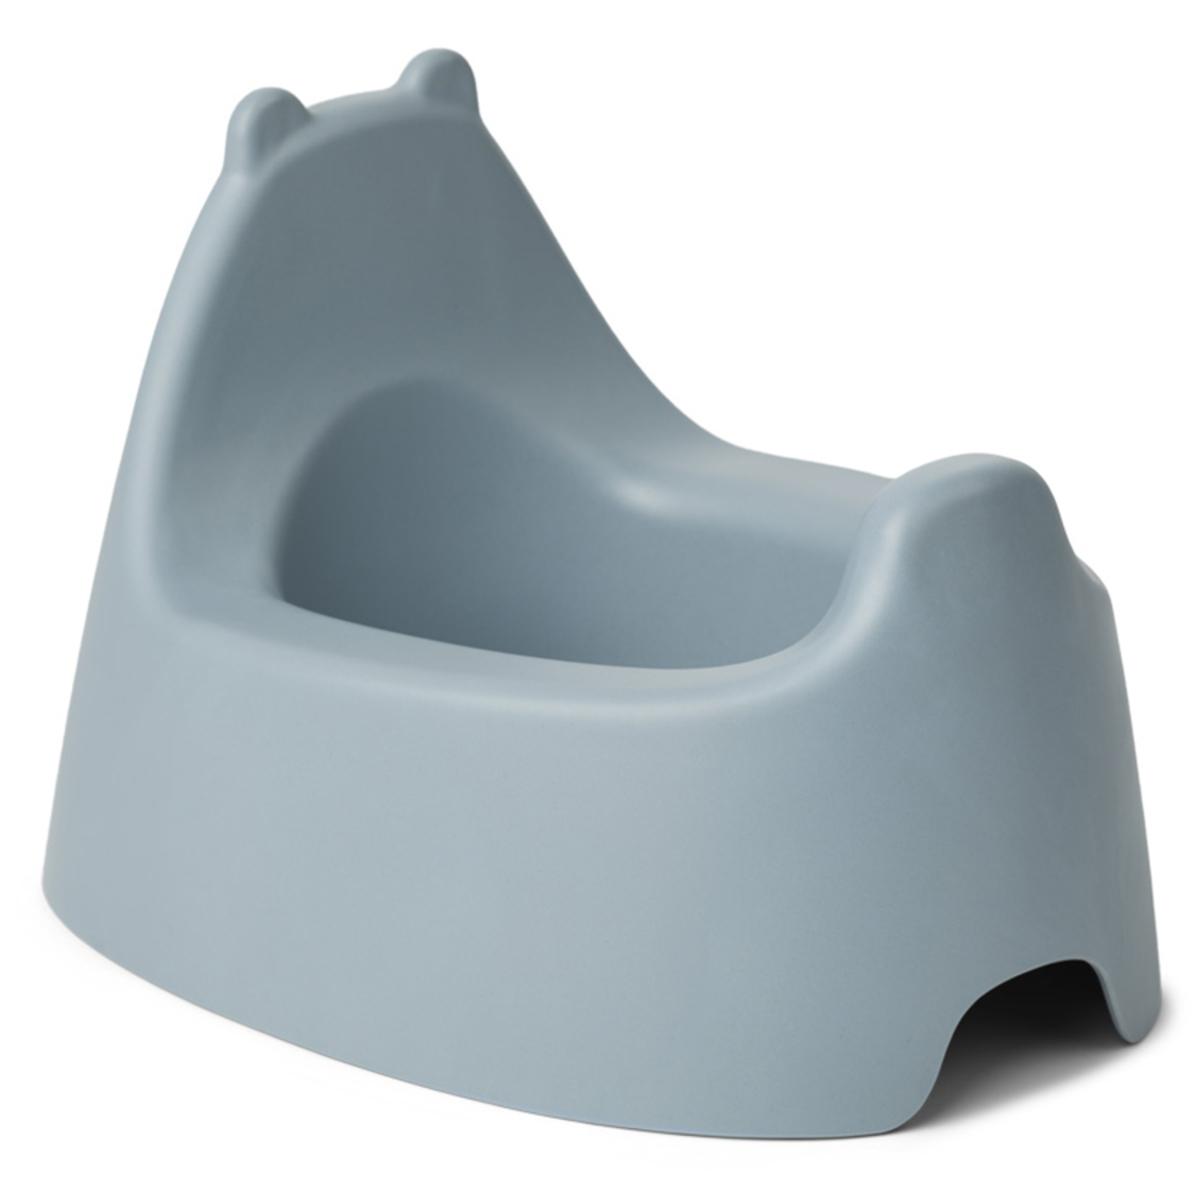 Pot & Réducteur Pot Bébé Jonatan - Sea Blue Pot Bébé Jonatan - Sea Blue